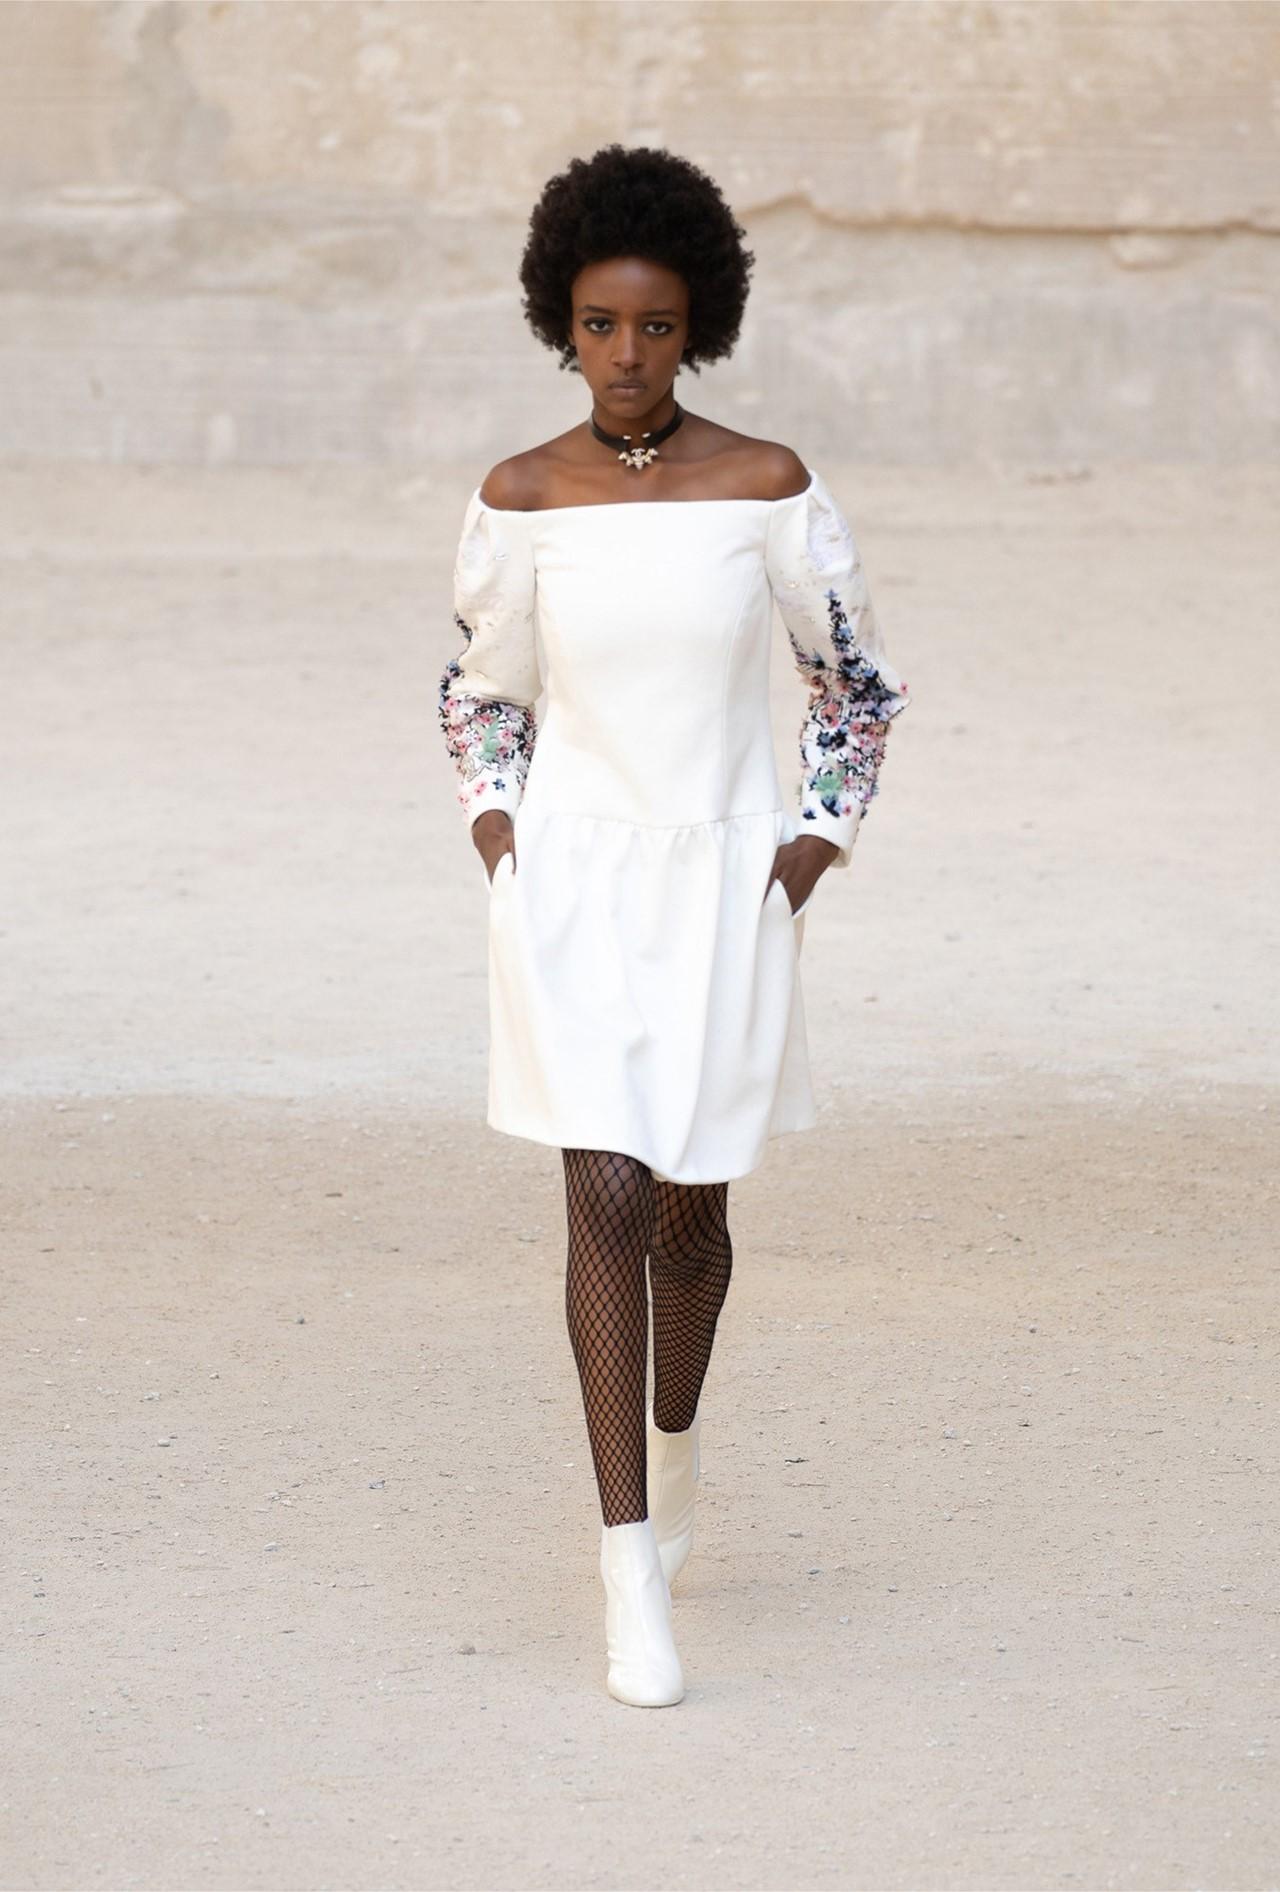 Chanel_Cruise_2022_Fashionela (41)